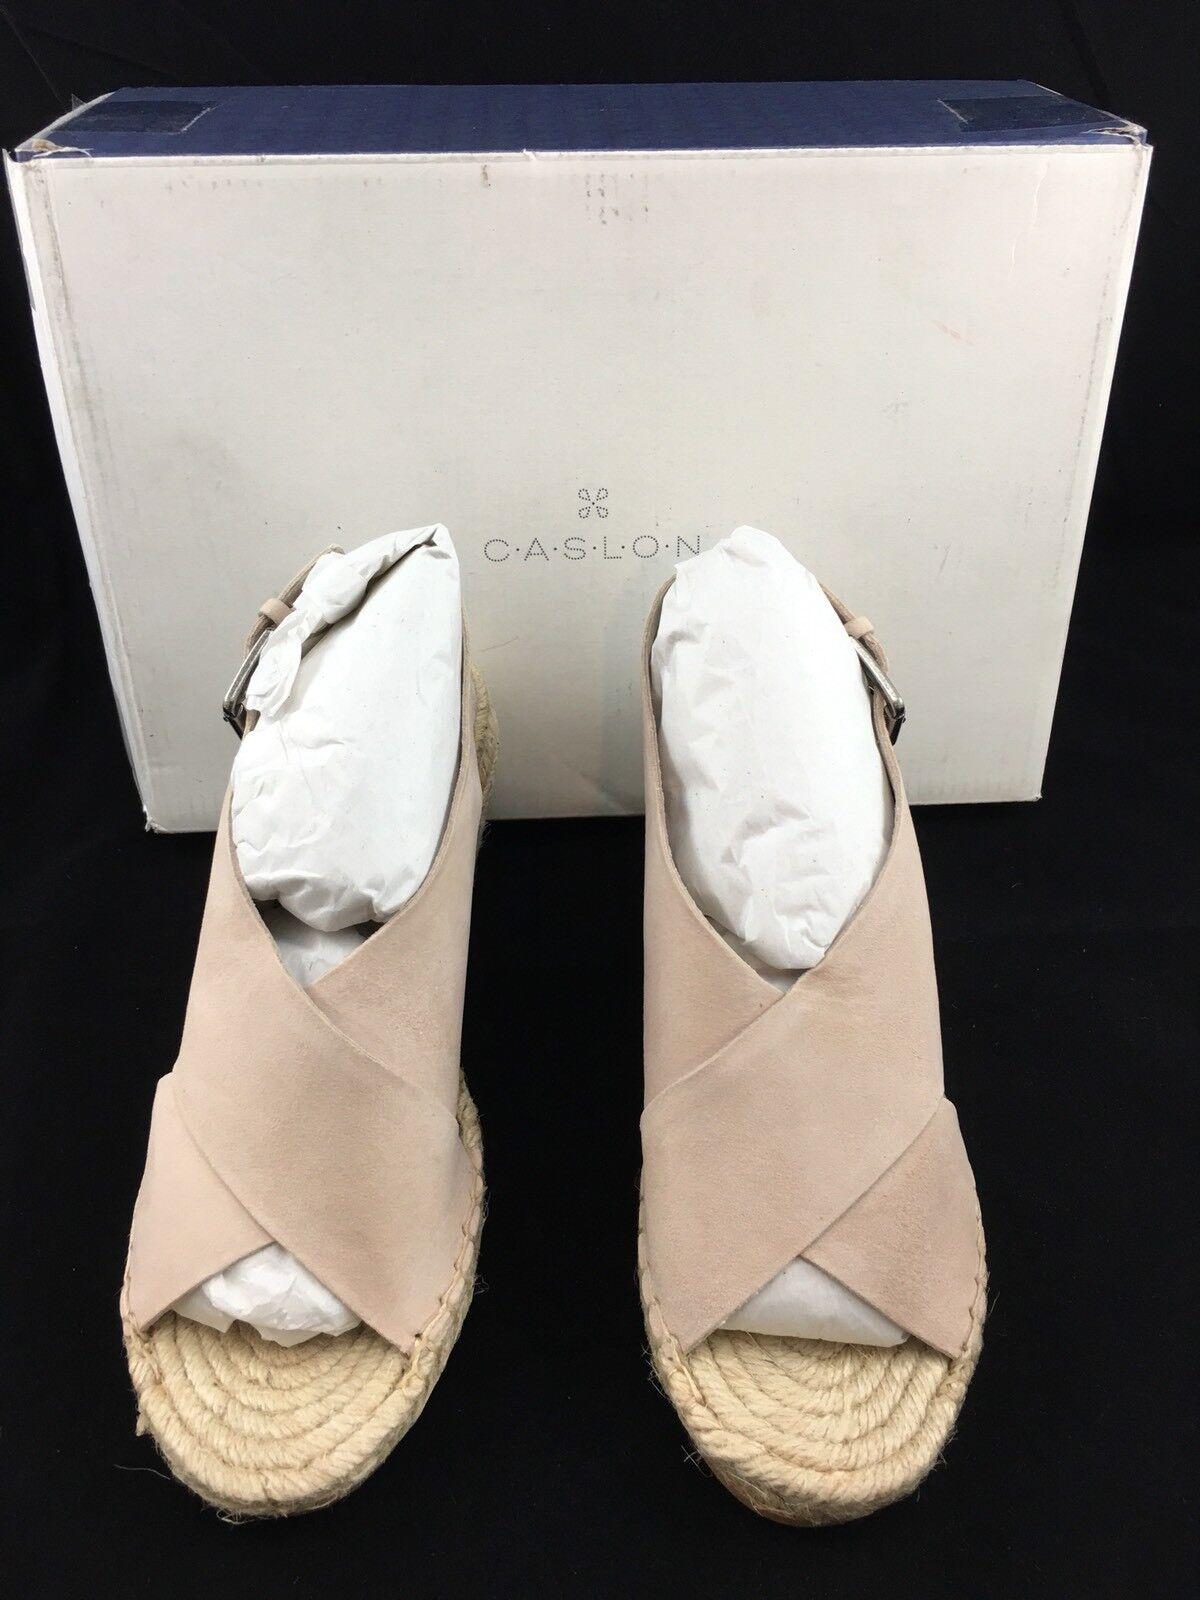 Caslon Suri bluesh bluesh bluesh Suede Leather Espadrille Wedge Sandals Size 5.5 ad951b